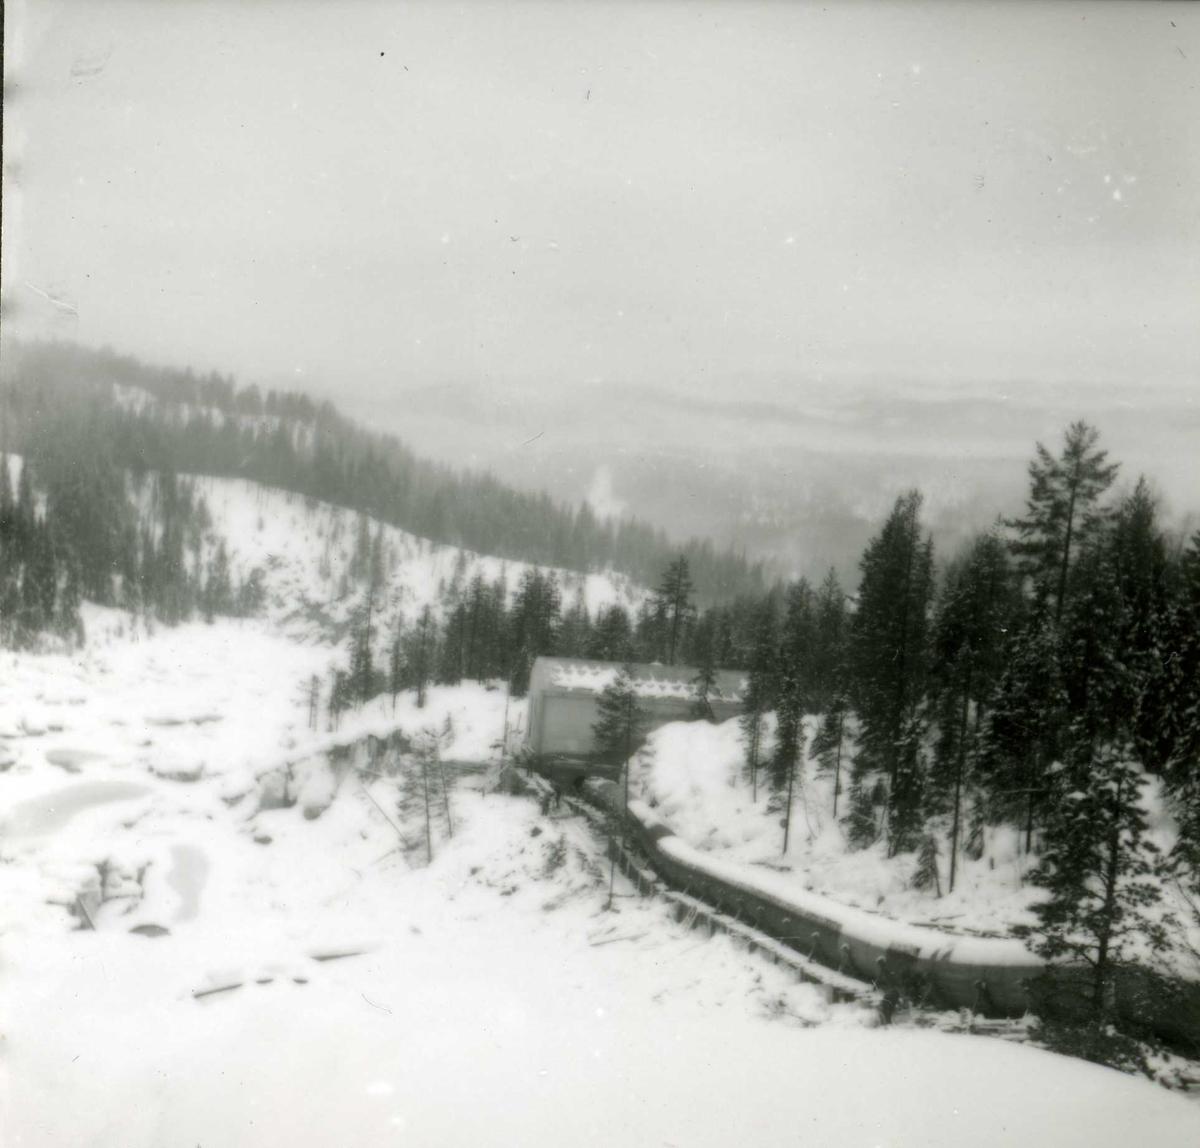 185-2 Hyllandsfossen kraftverk